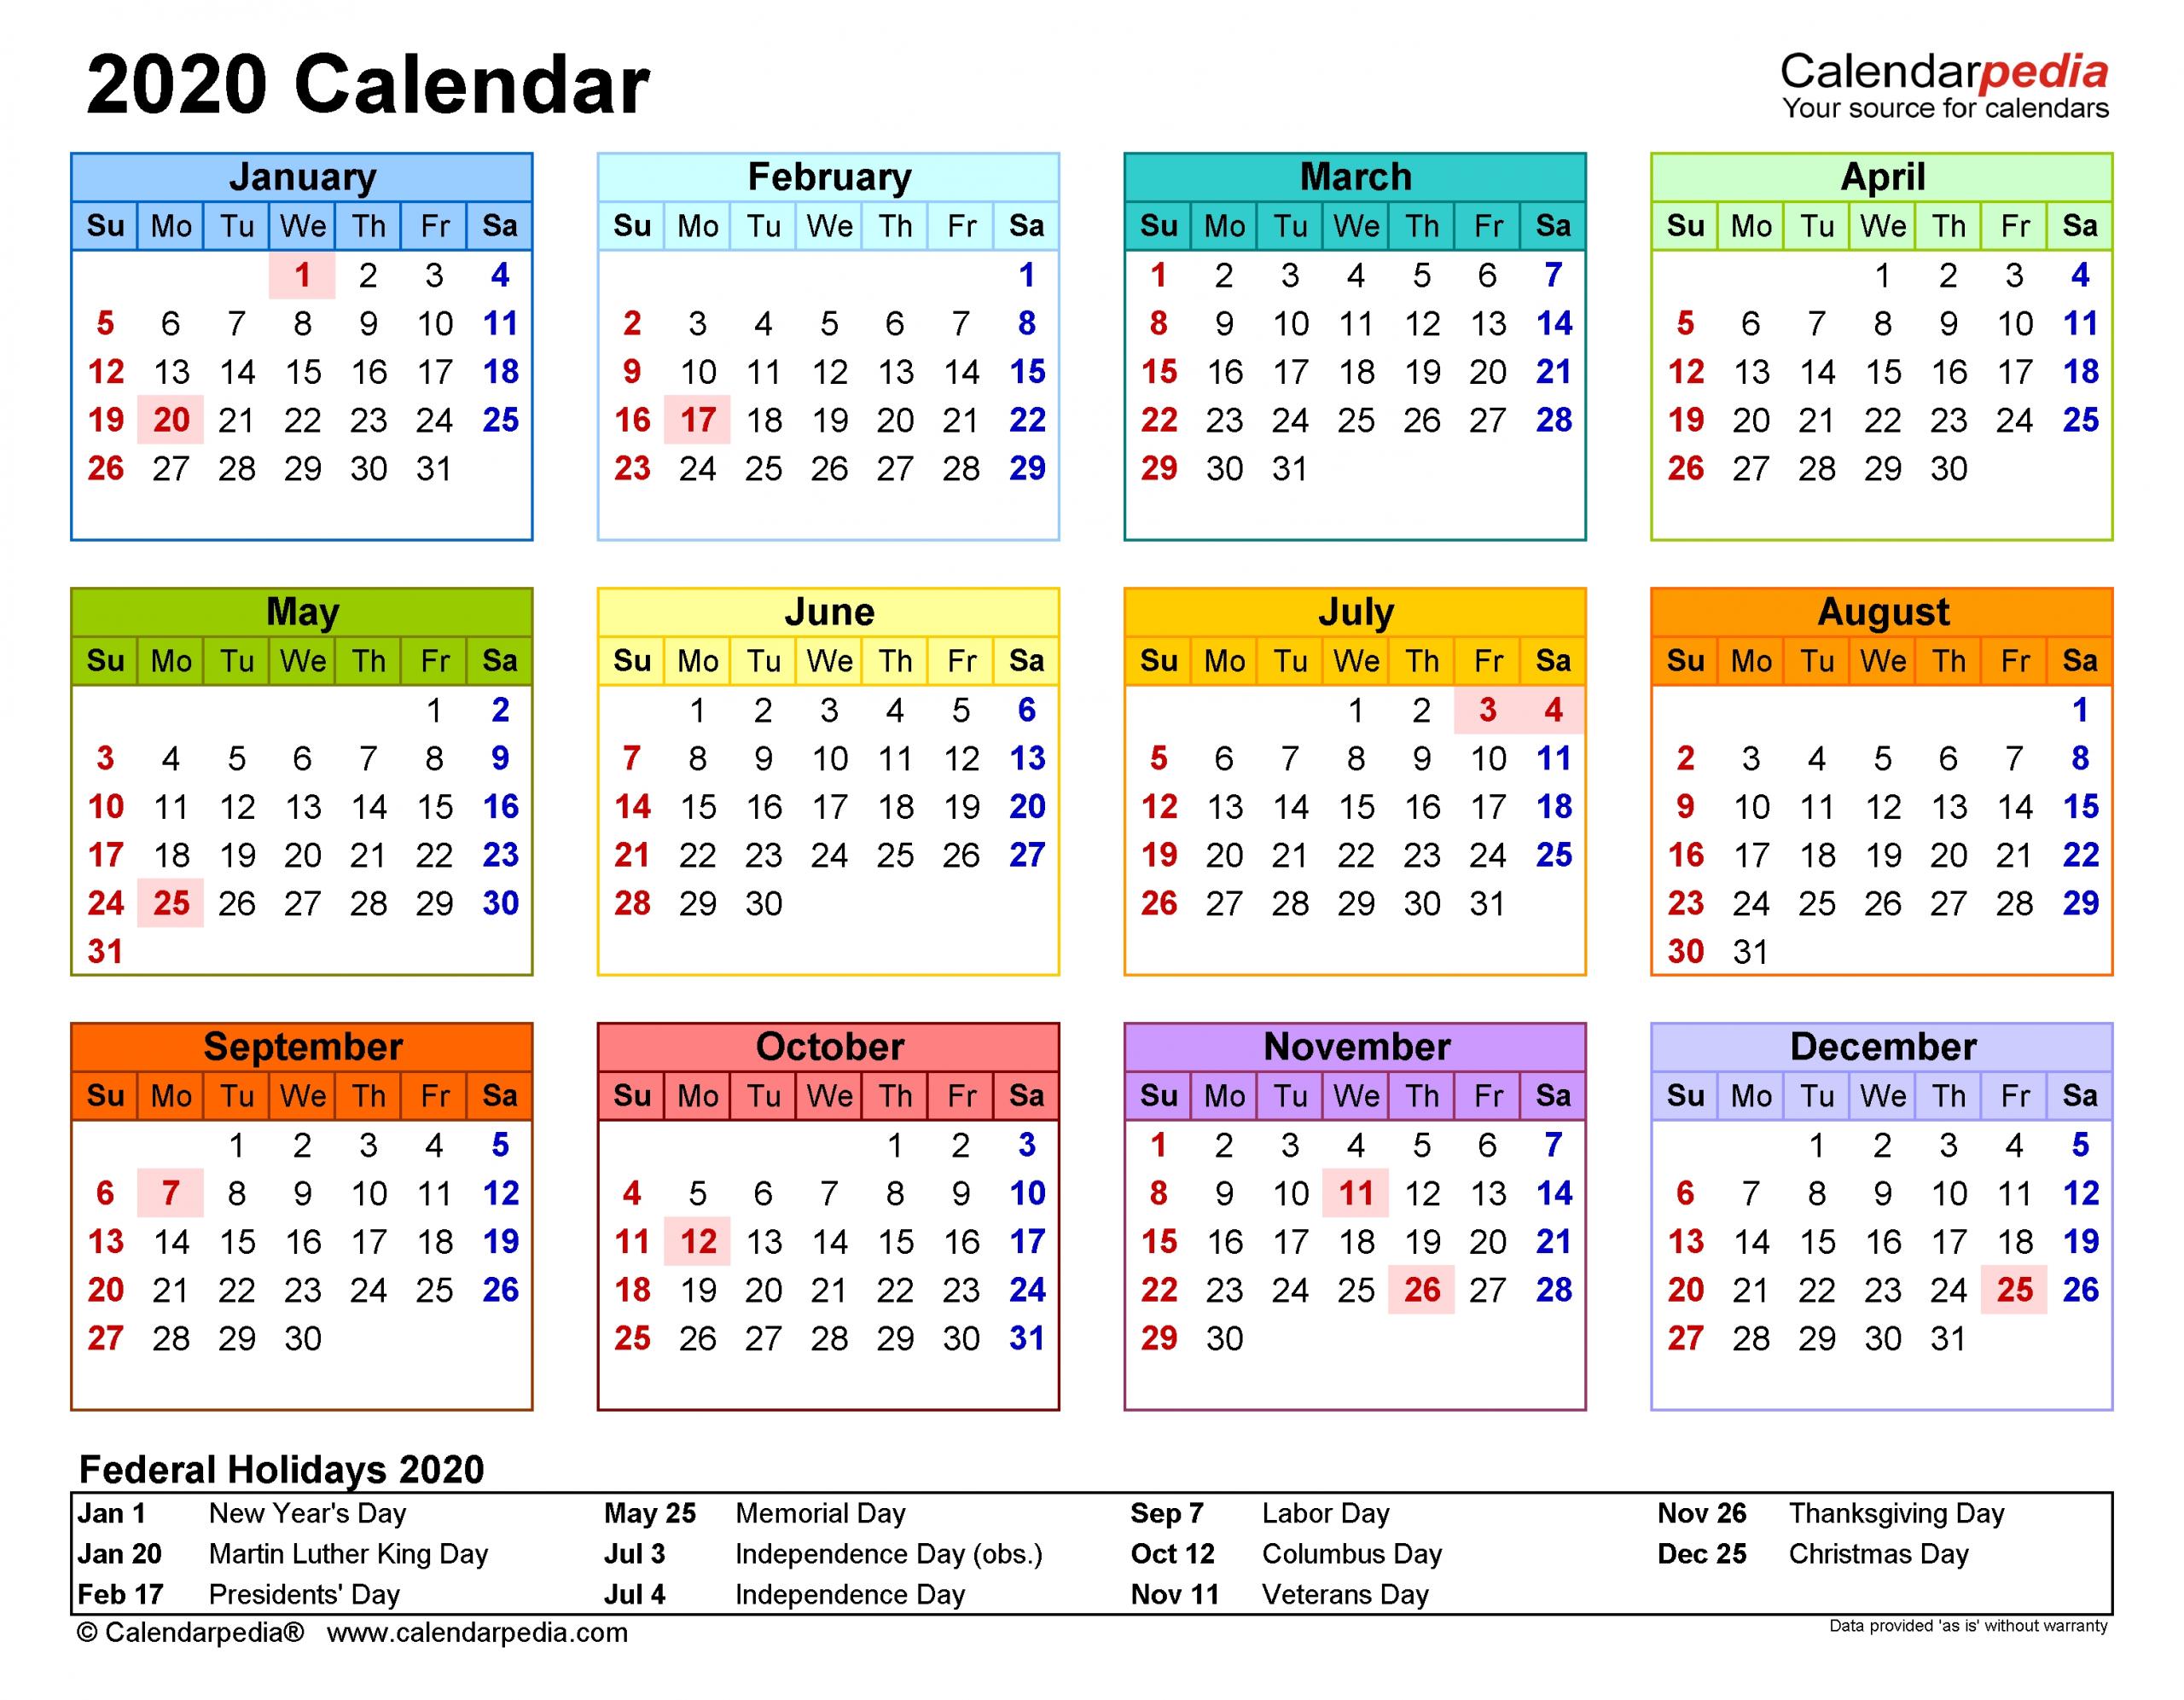 2020 Calendar - Free Printable Pdf Templates - Calendarpedia with regard to Printable Calendars 2020 Pocket Size